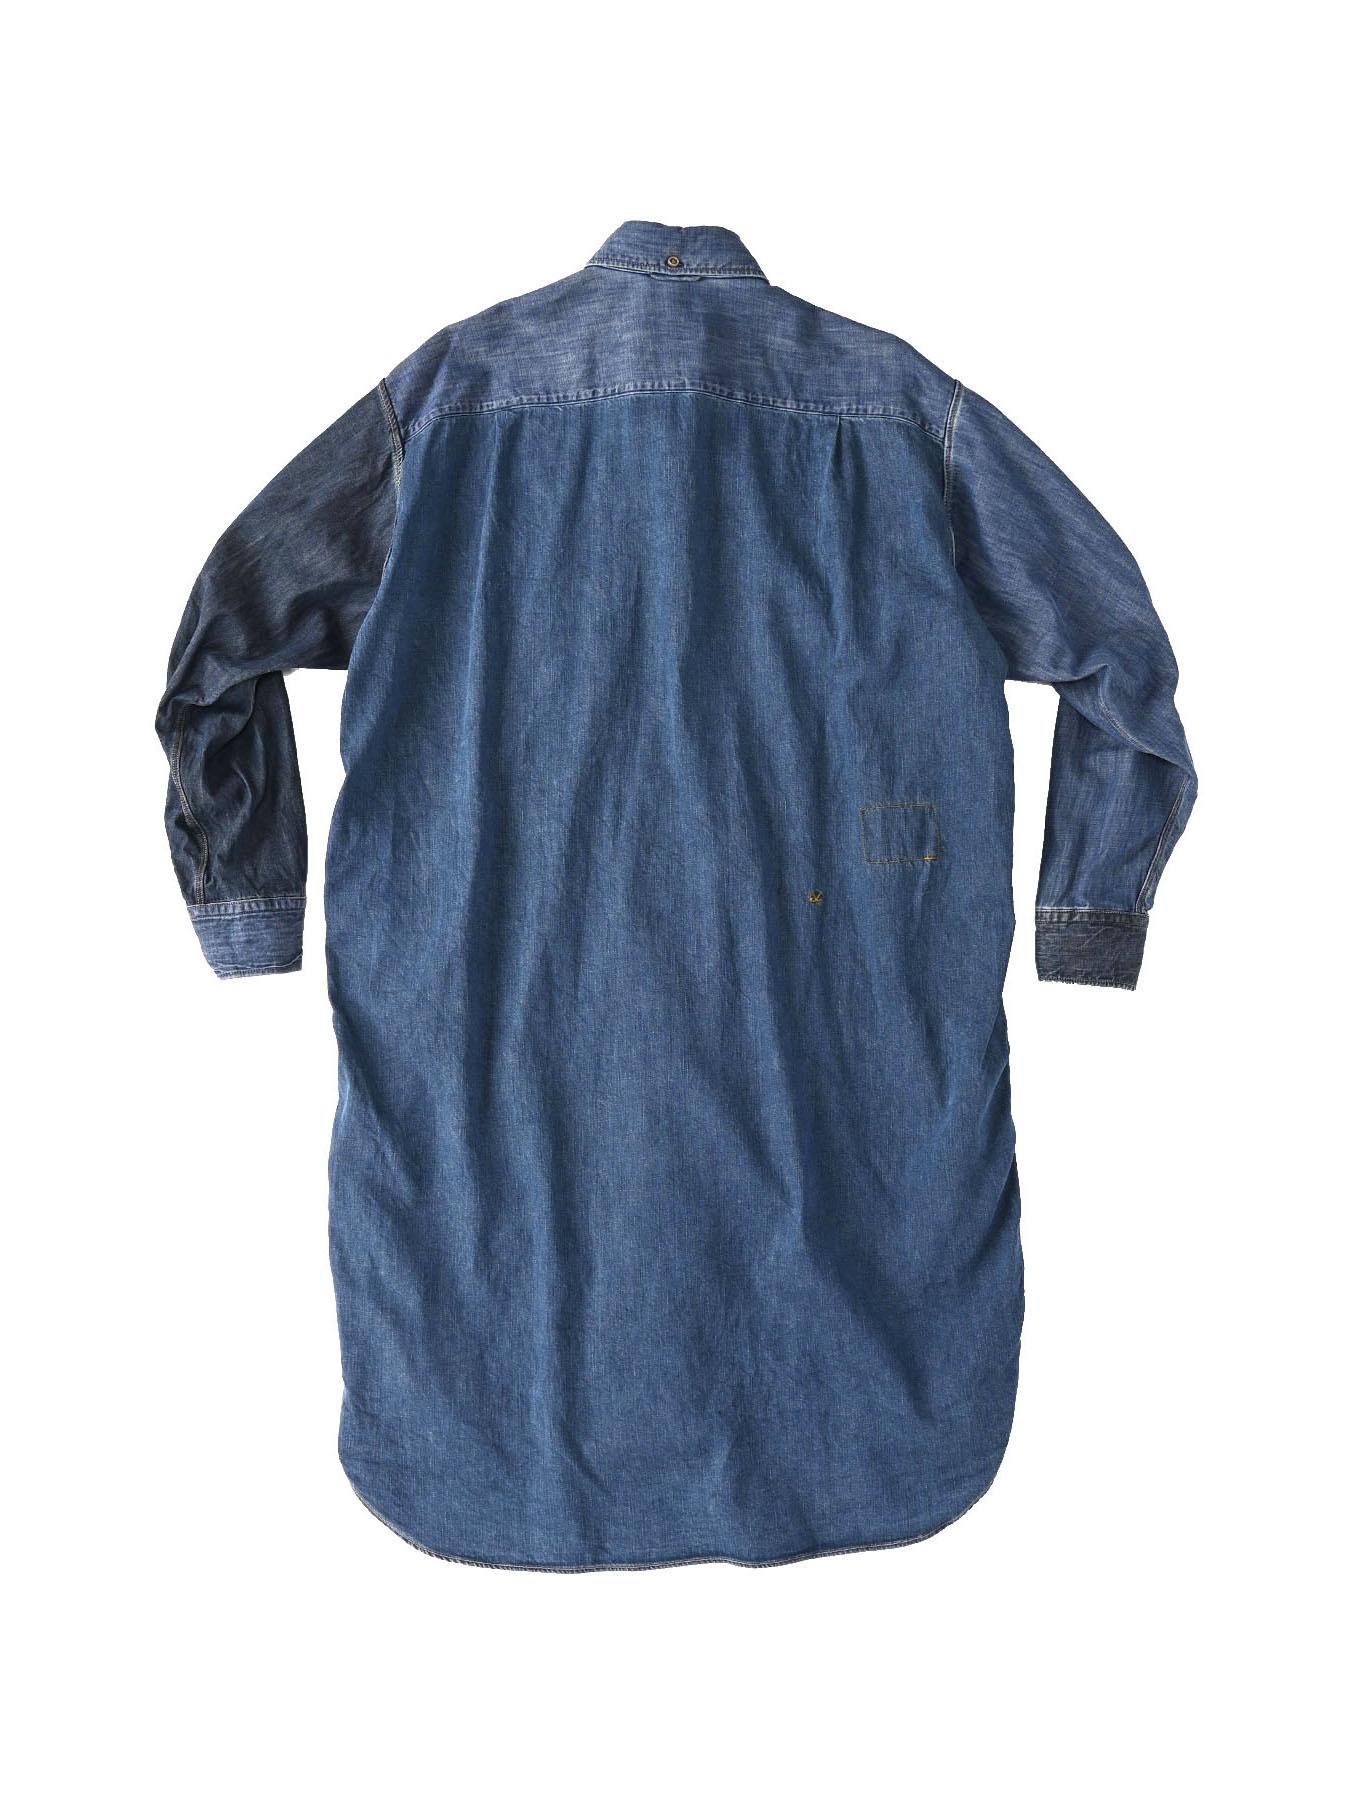 Indigo Zenin Shugo Smock Dress-5